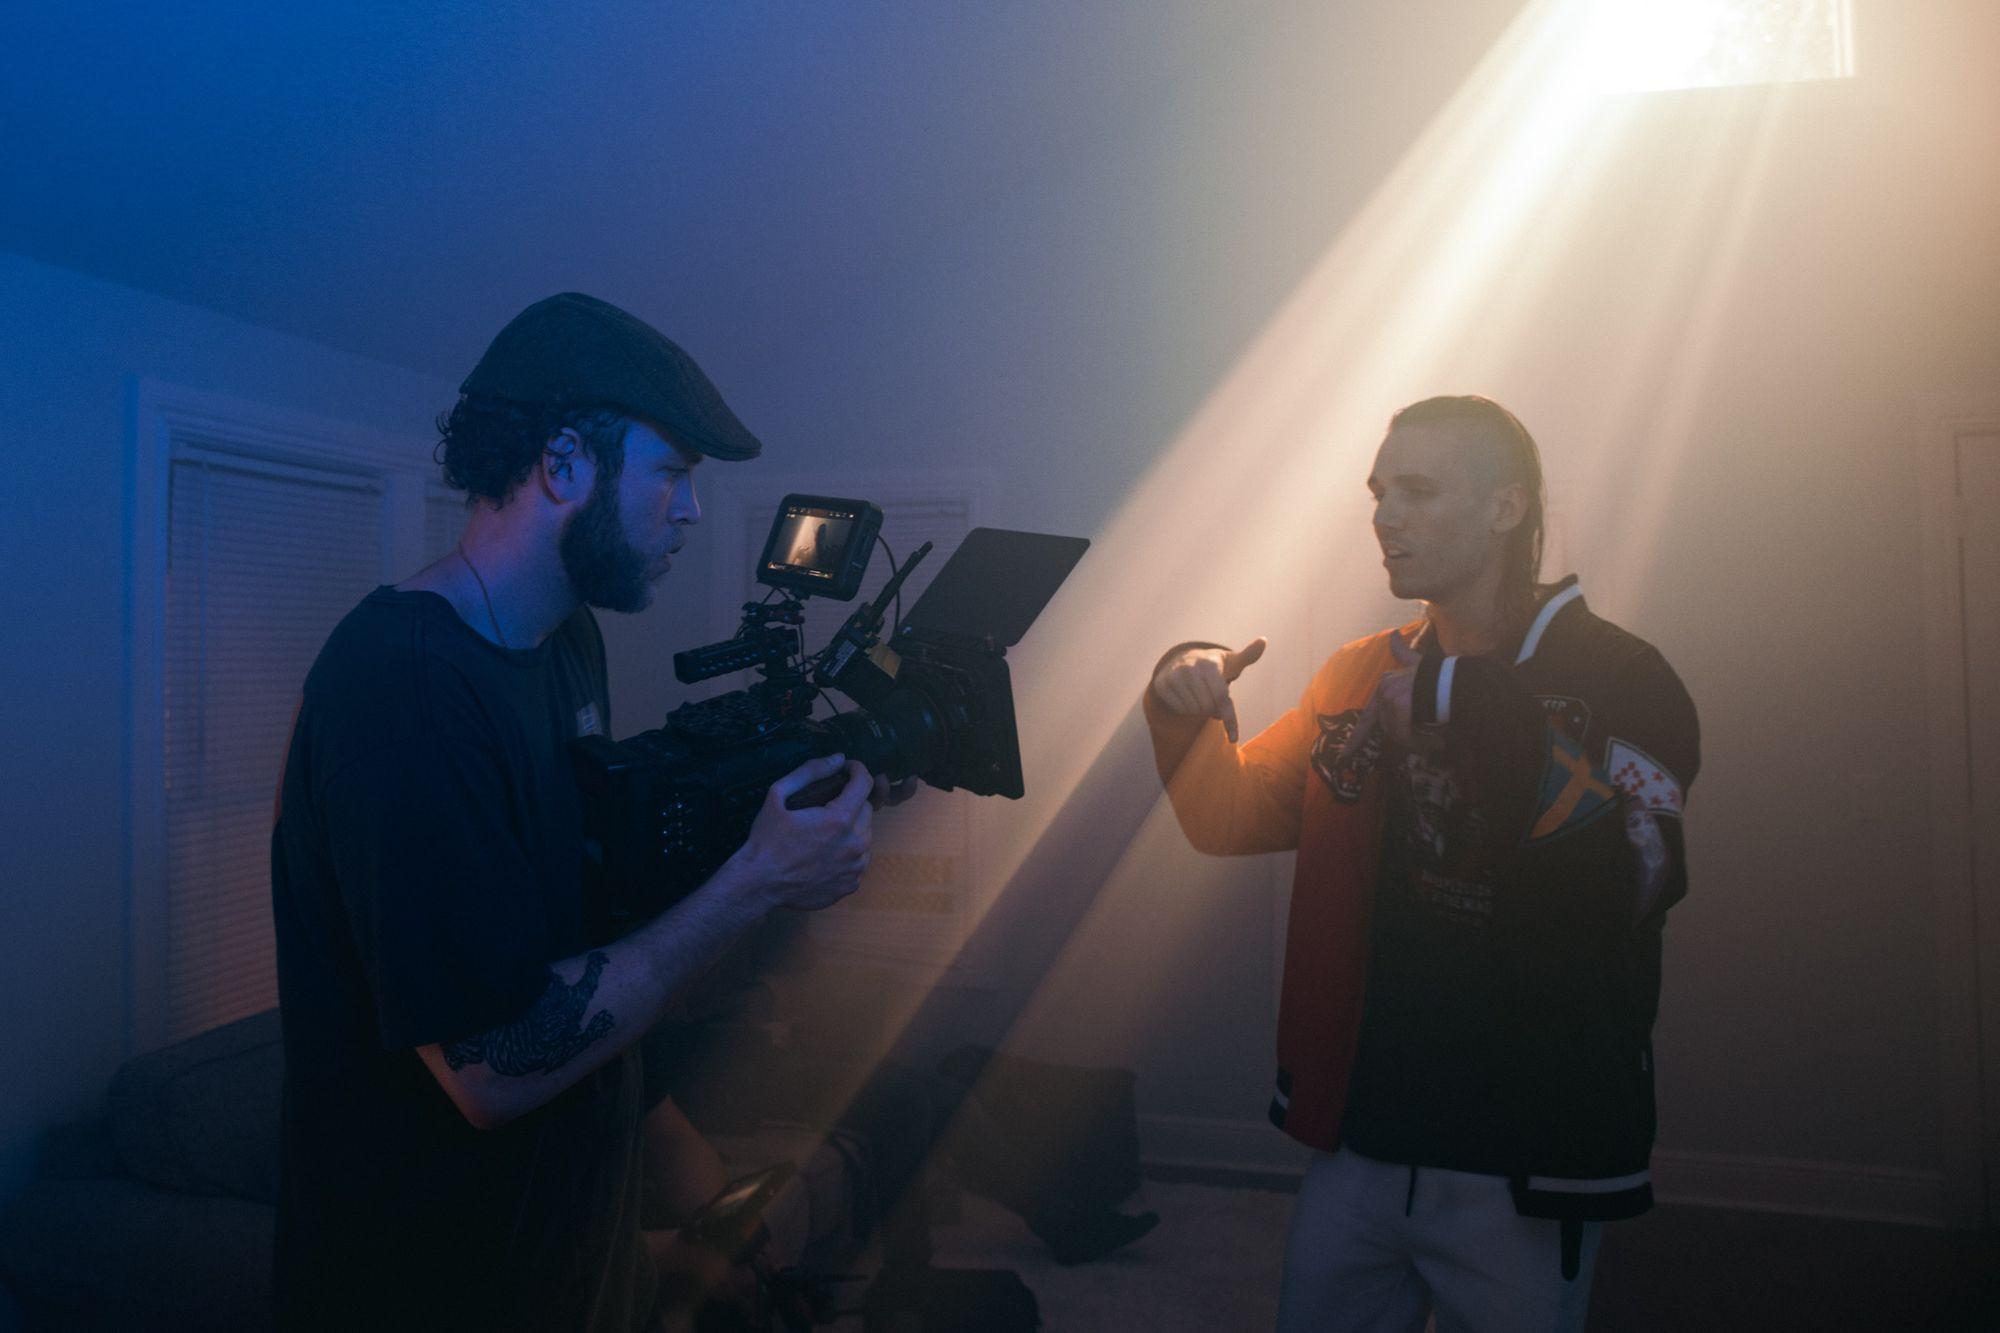 Lighting setup in cinematography